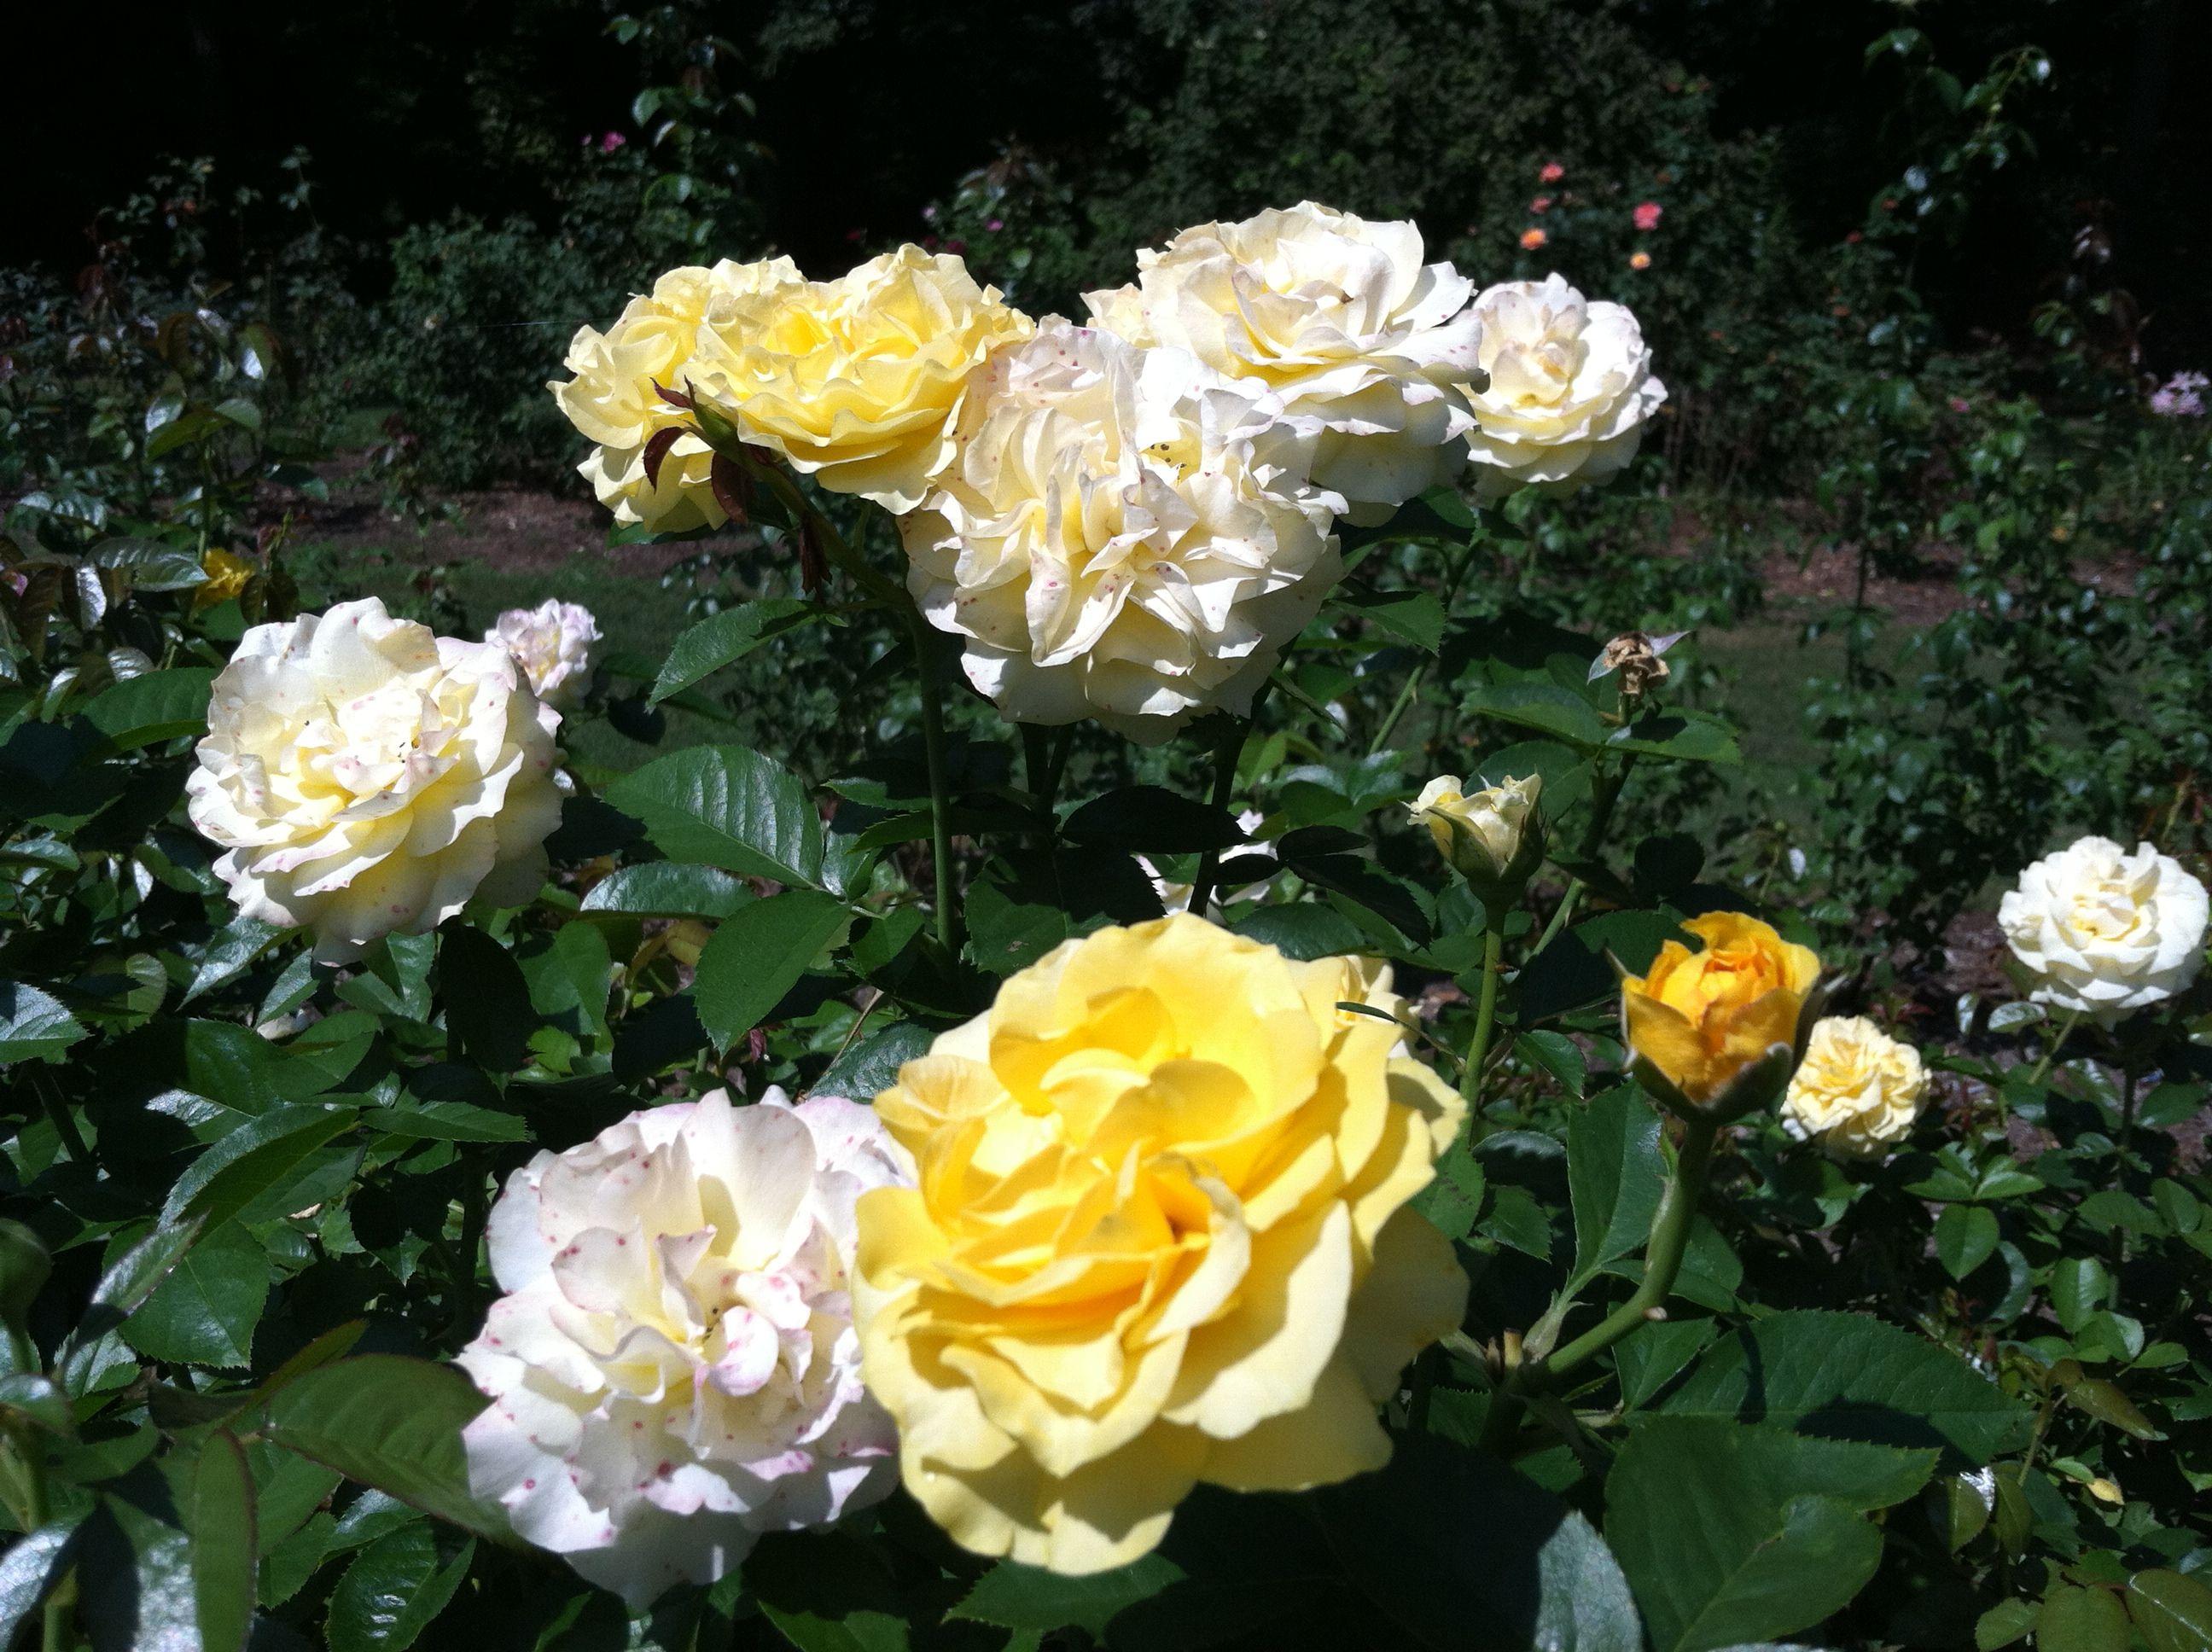 Rose Garden, Raleigh, NC Rose, Simply beautiful, Rose garden